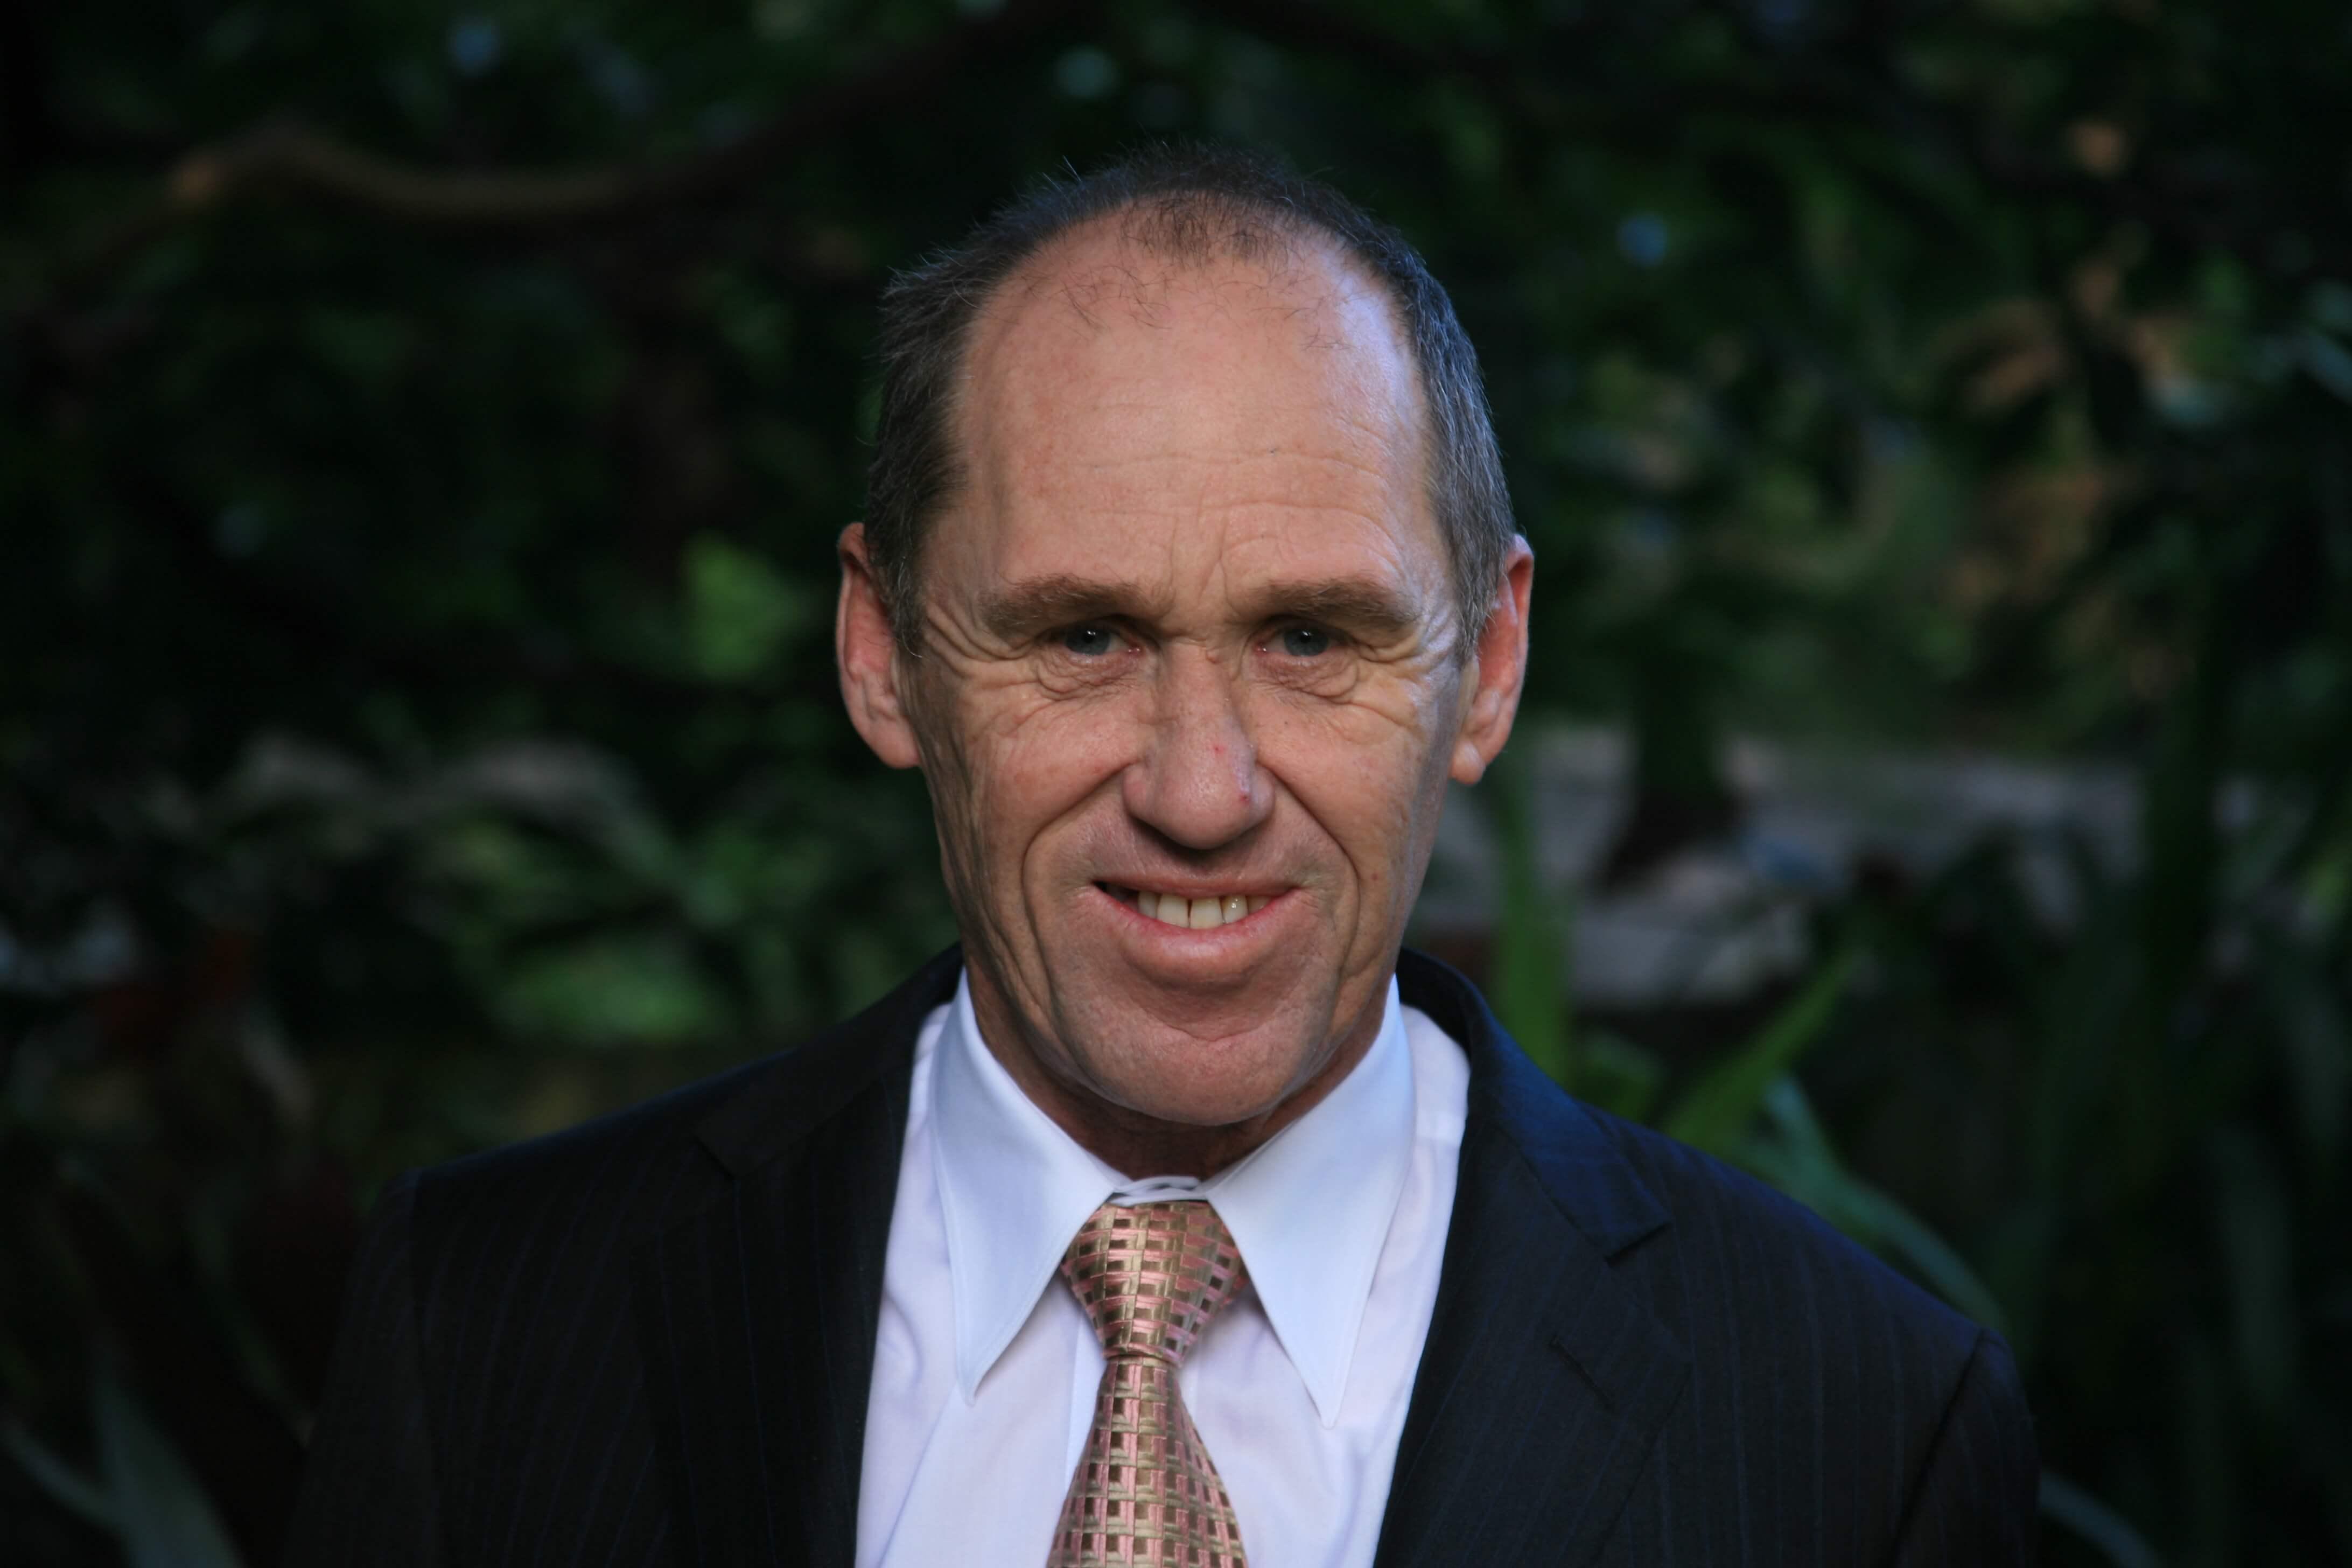 The Role of Peace in the 21st Century – A Prerequisite for Survival? – Steve Killelea (Tech Philanthropist)